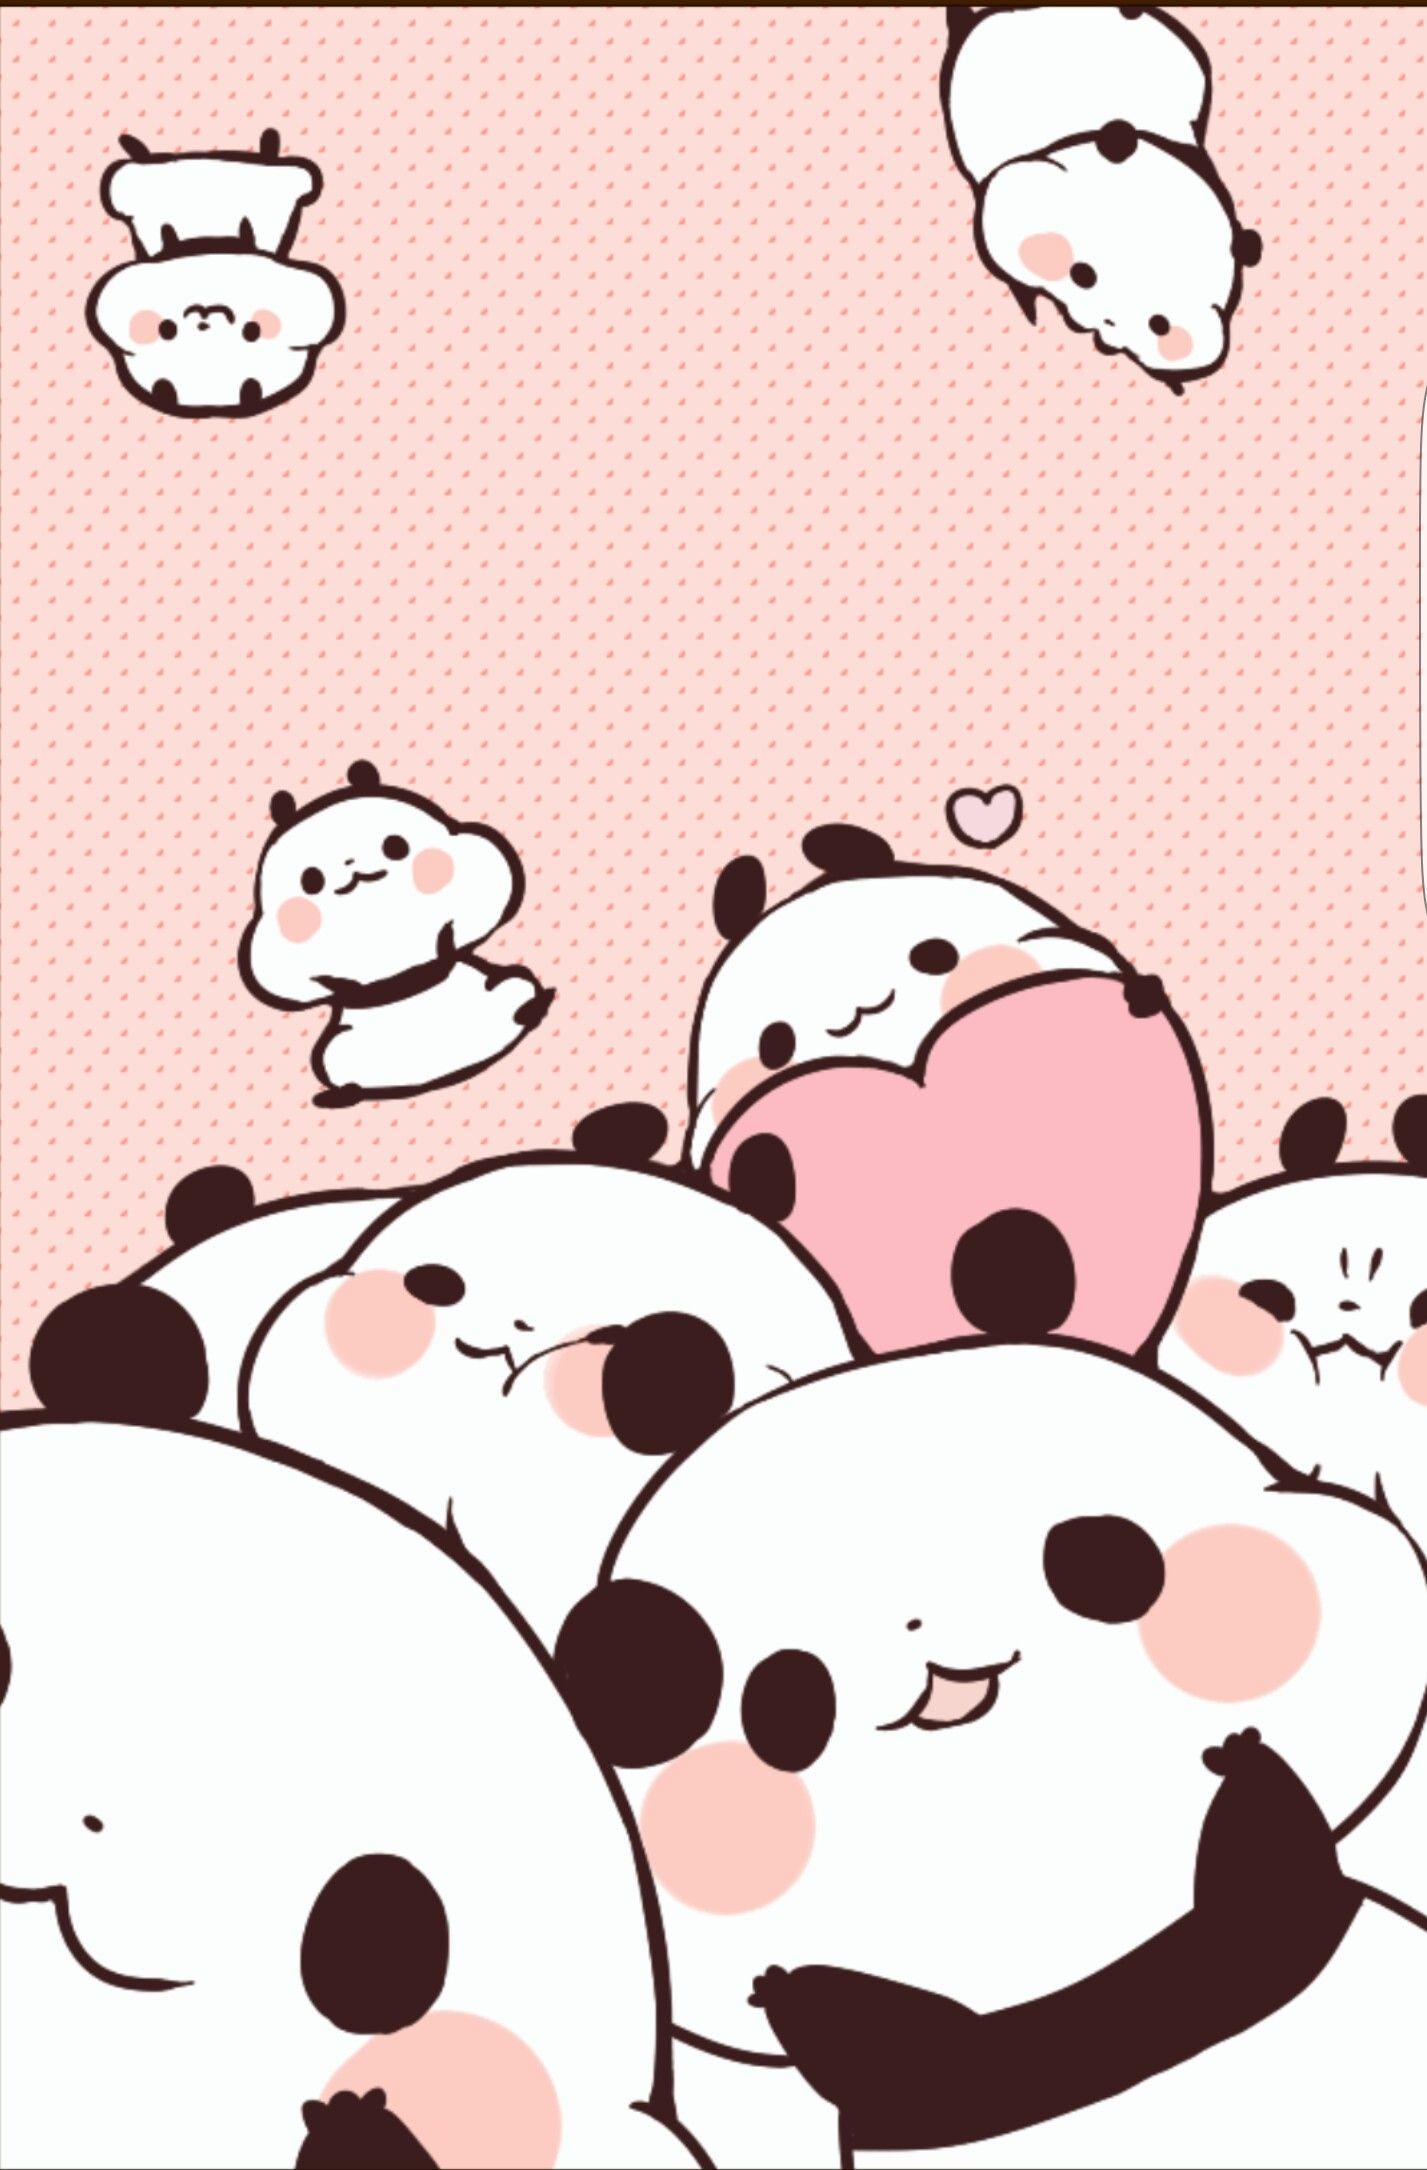 Cute Ipod Wallpapers For Walls Pin De Mary Sl En Kawaii En 2018 Pinterest Kawaii